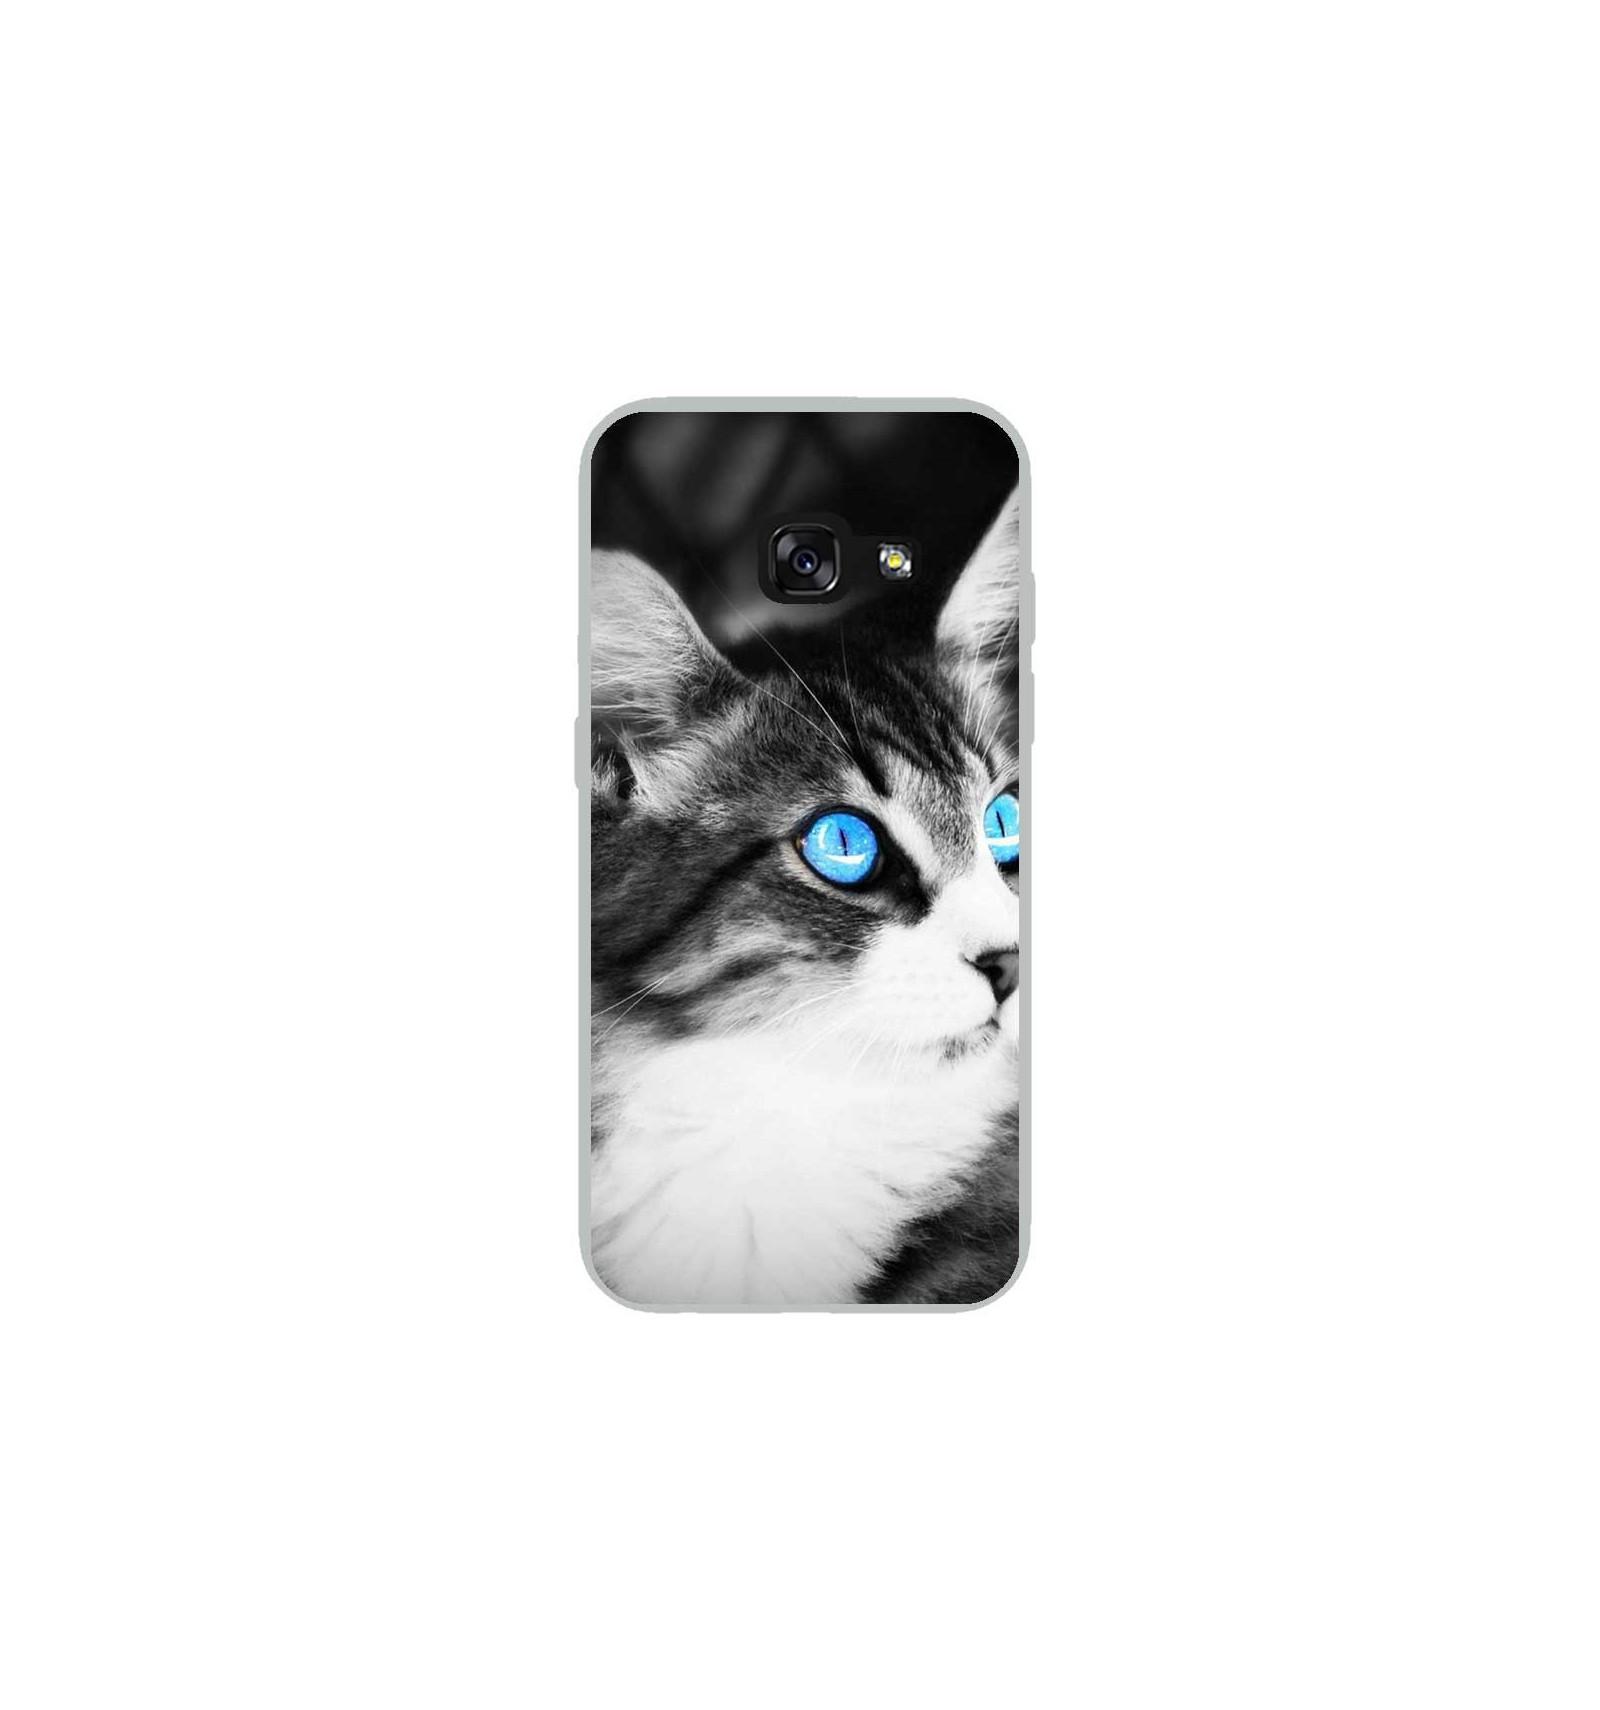 Coque en silicone Samsung Galaxy A5 2017 - Chat yeux bleu